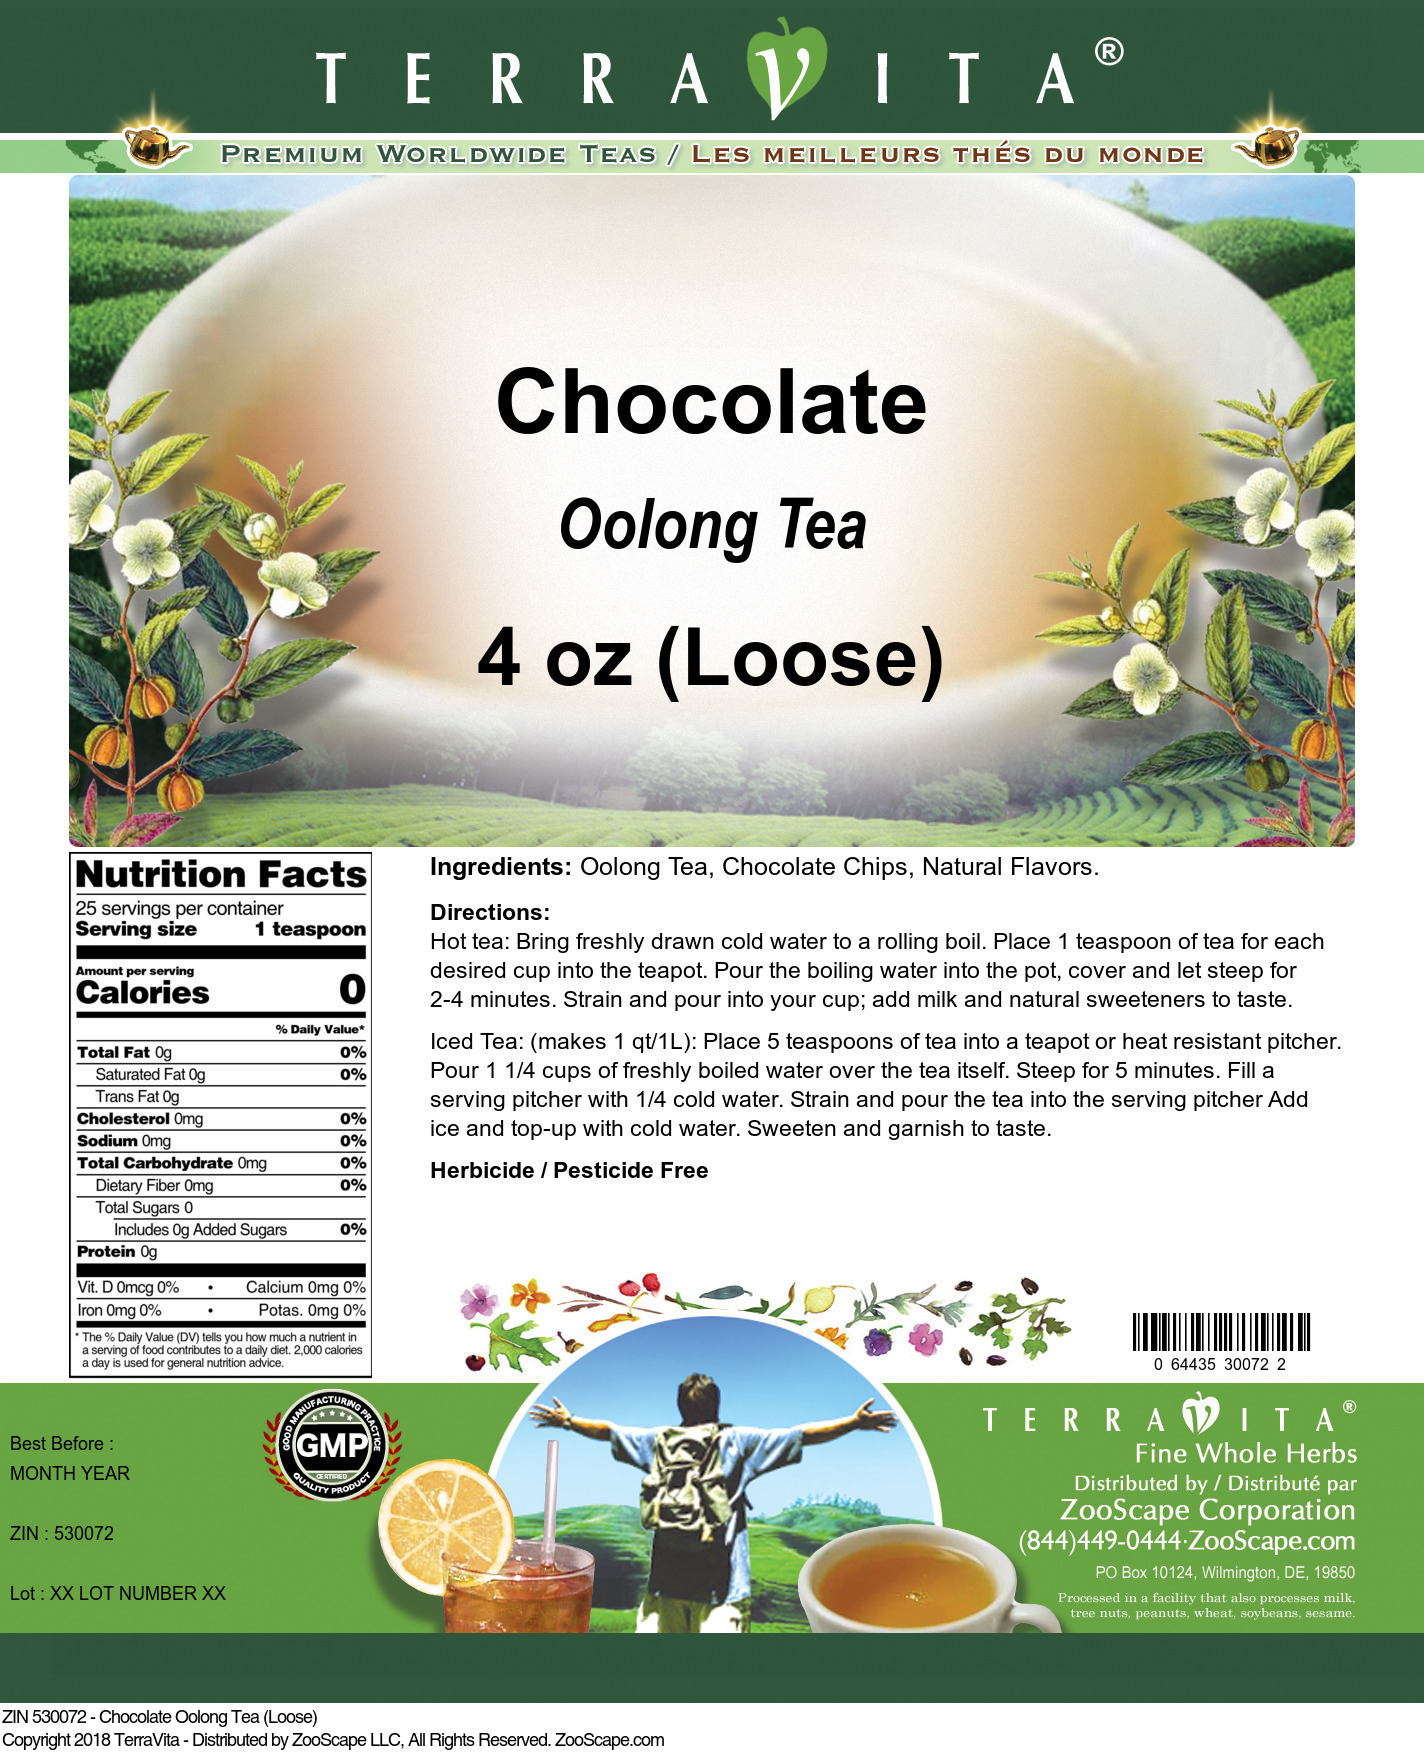 Chocolate Oolong Tea